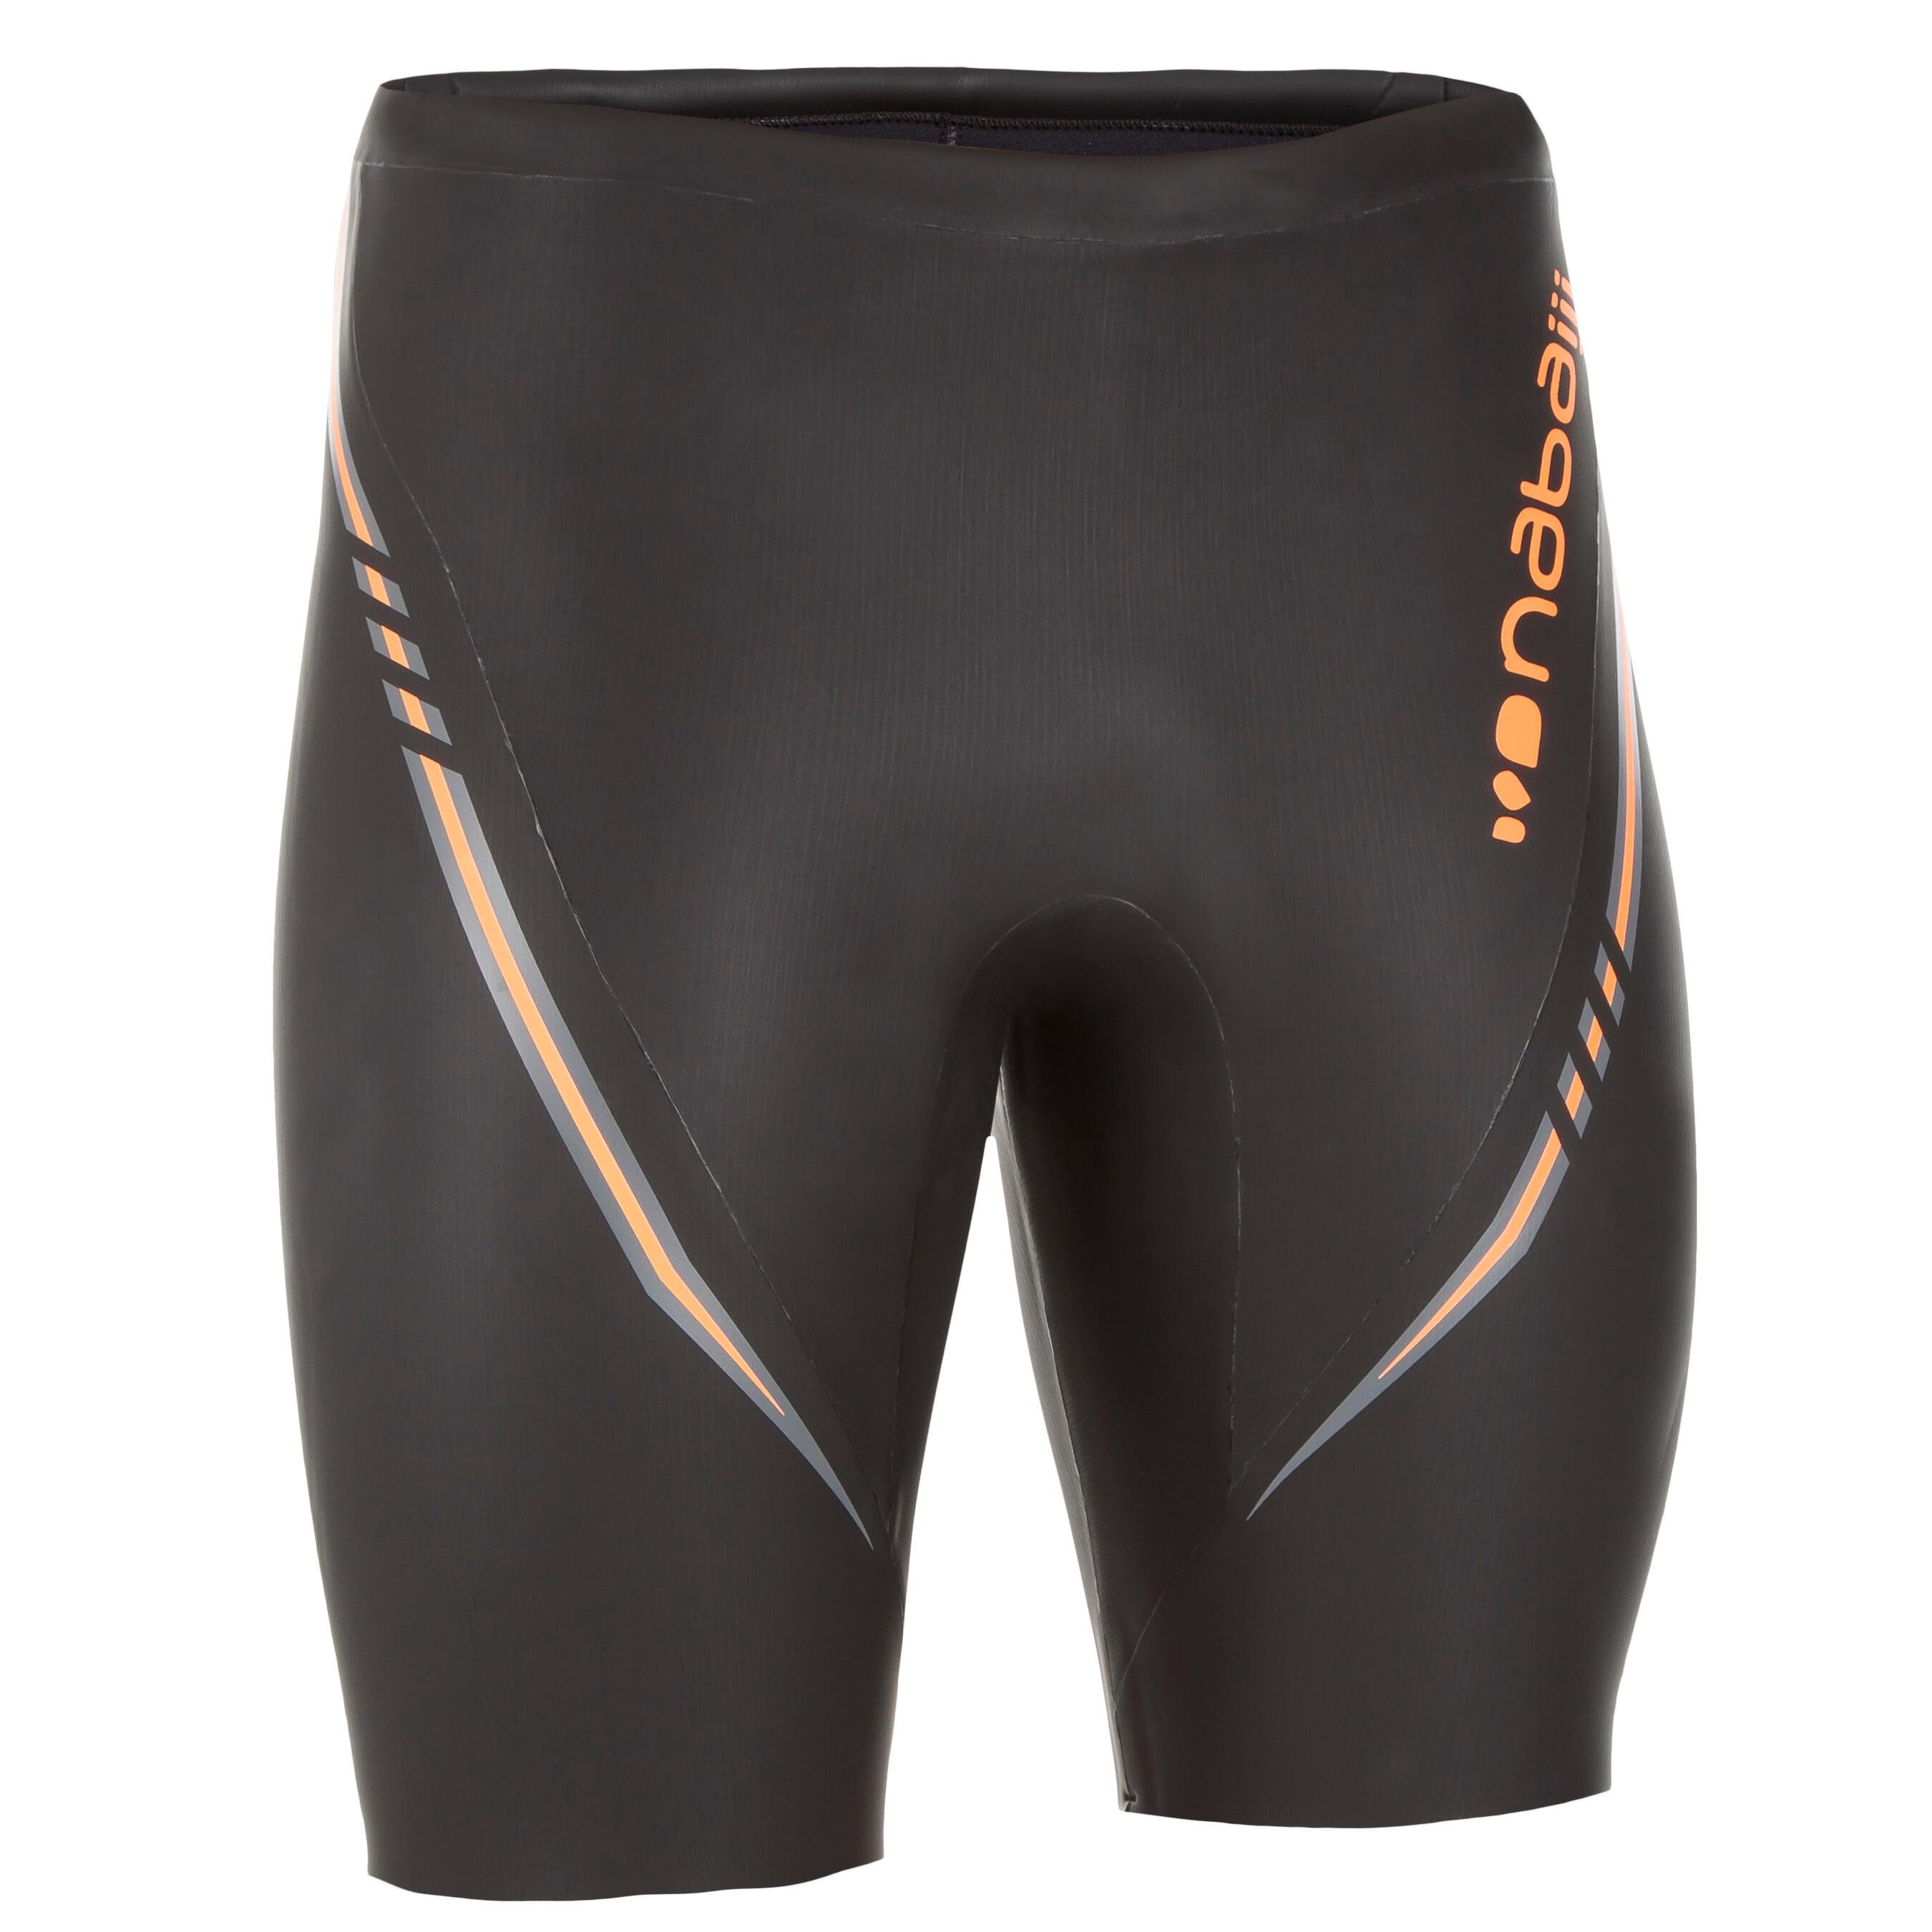 Boxeri înot neopren 4 mm Negru la Reducere poza